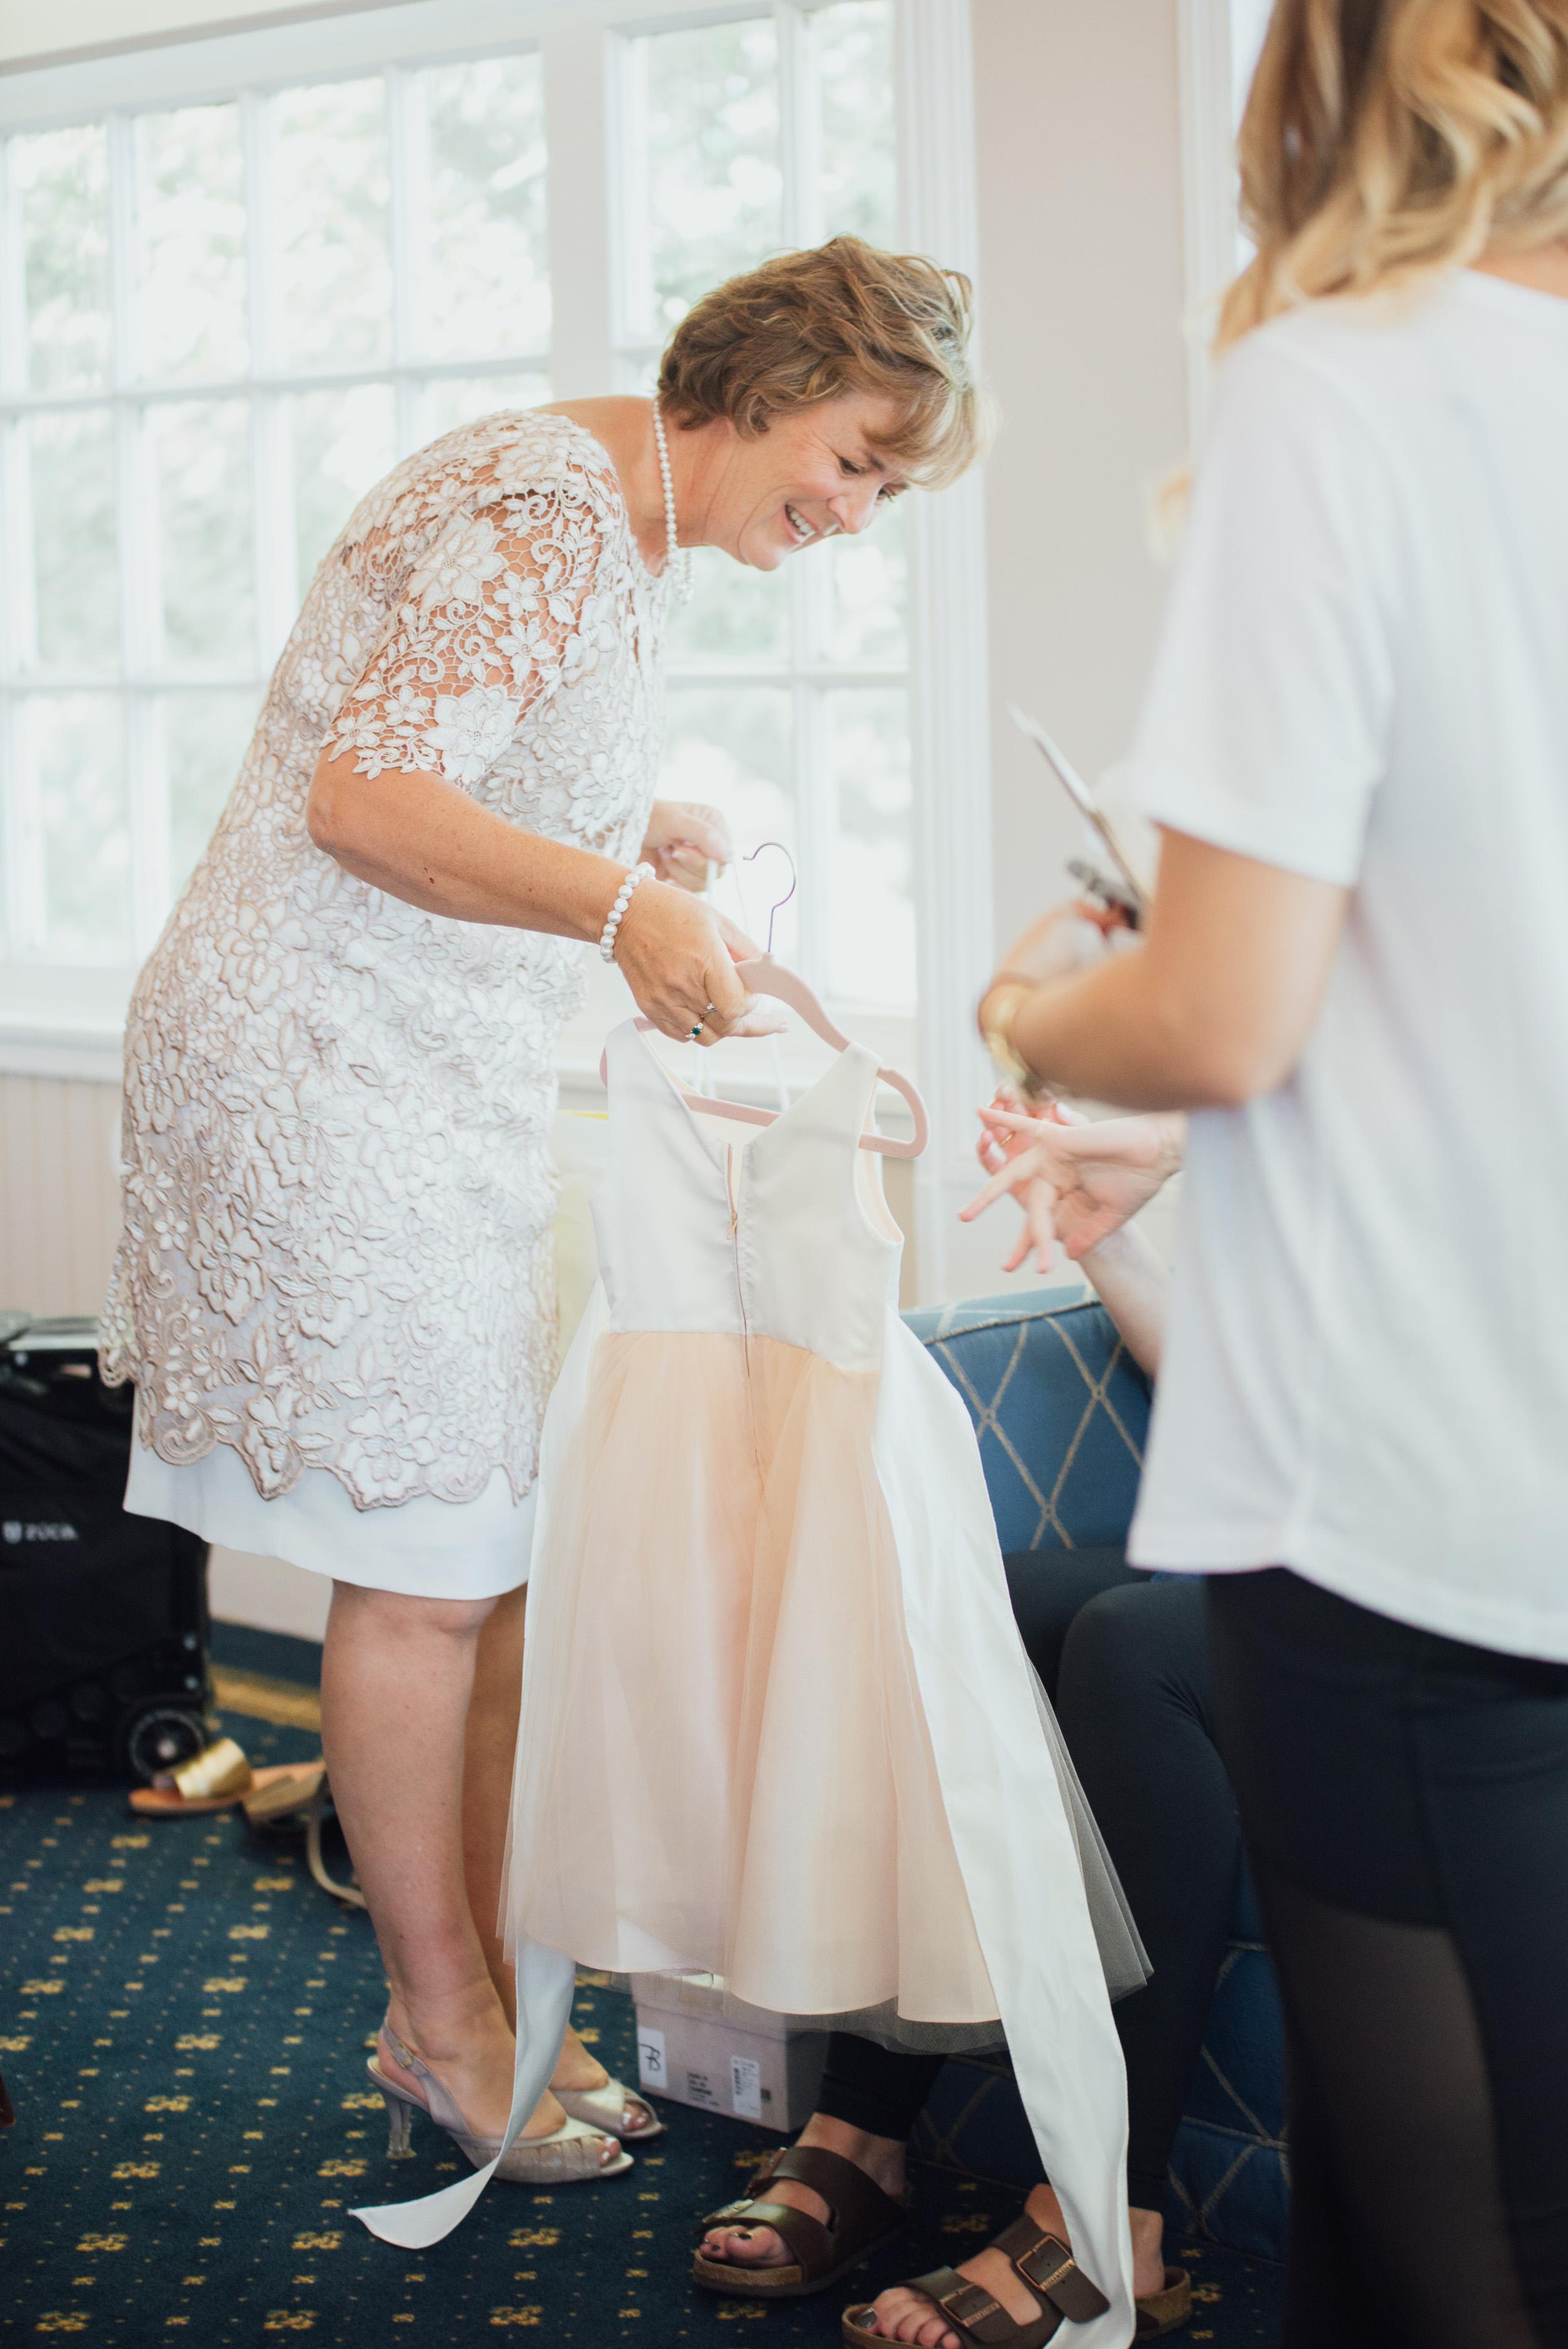 cleland-studios-wedding-photography-19.jpg